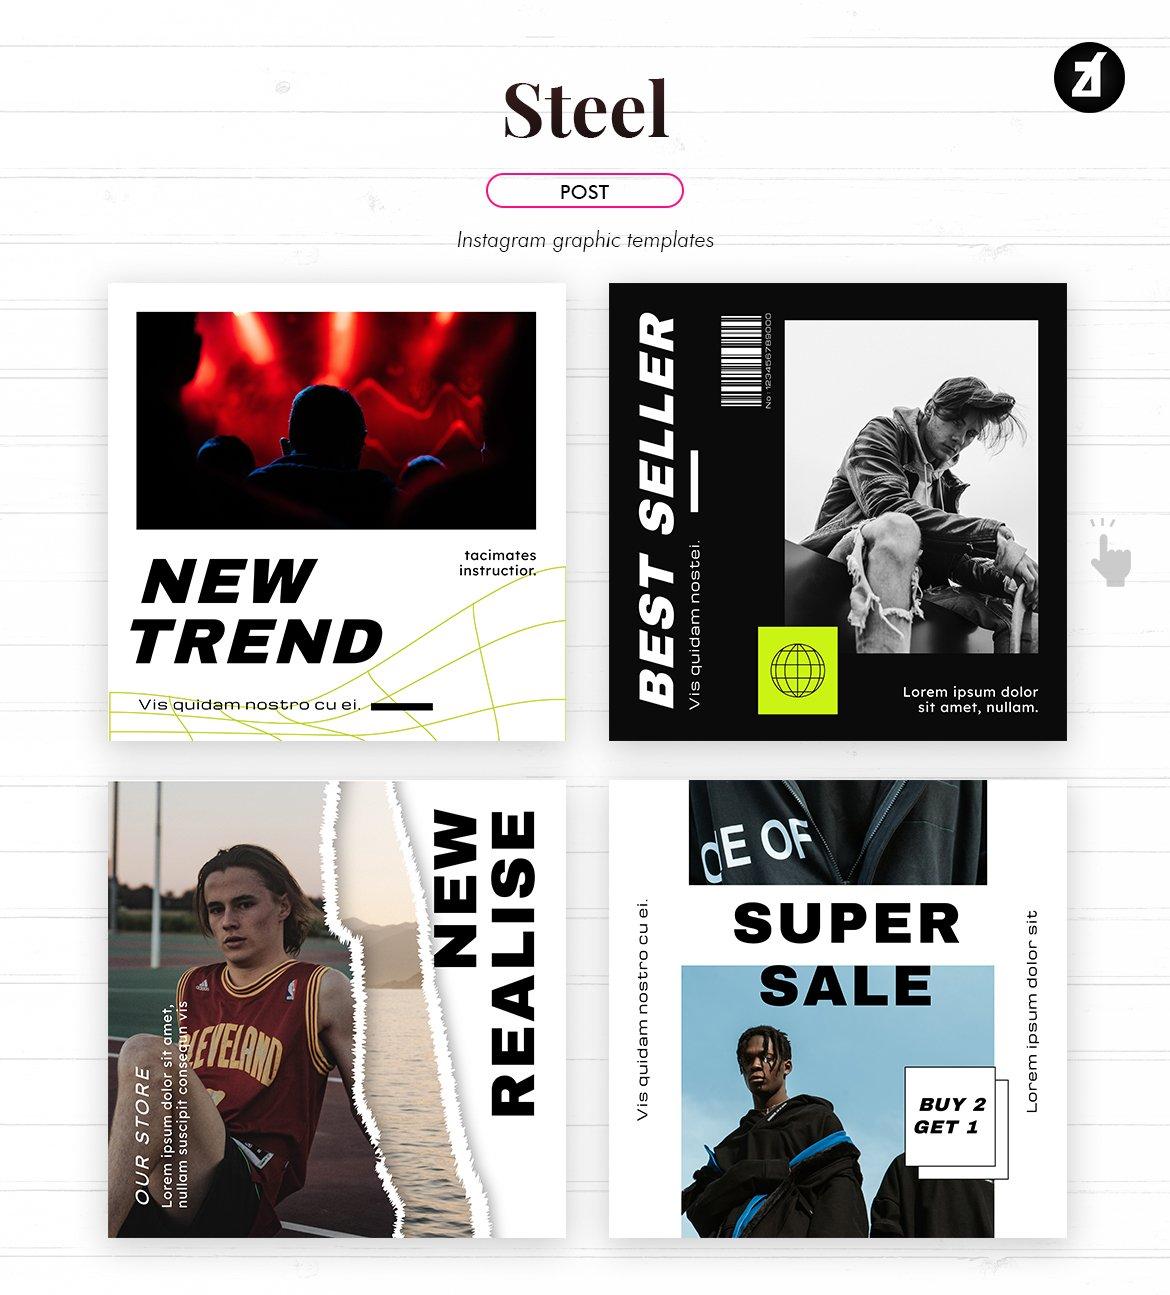 潮流撕纸效果新媒体推广海报设计模板 Steel Social Media Graphic Templates插图(2)